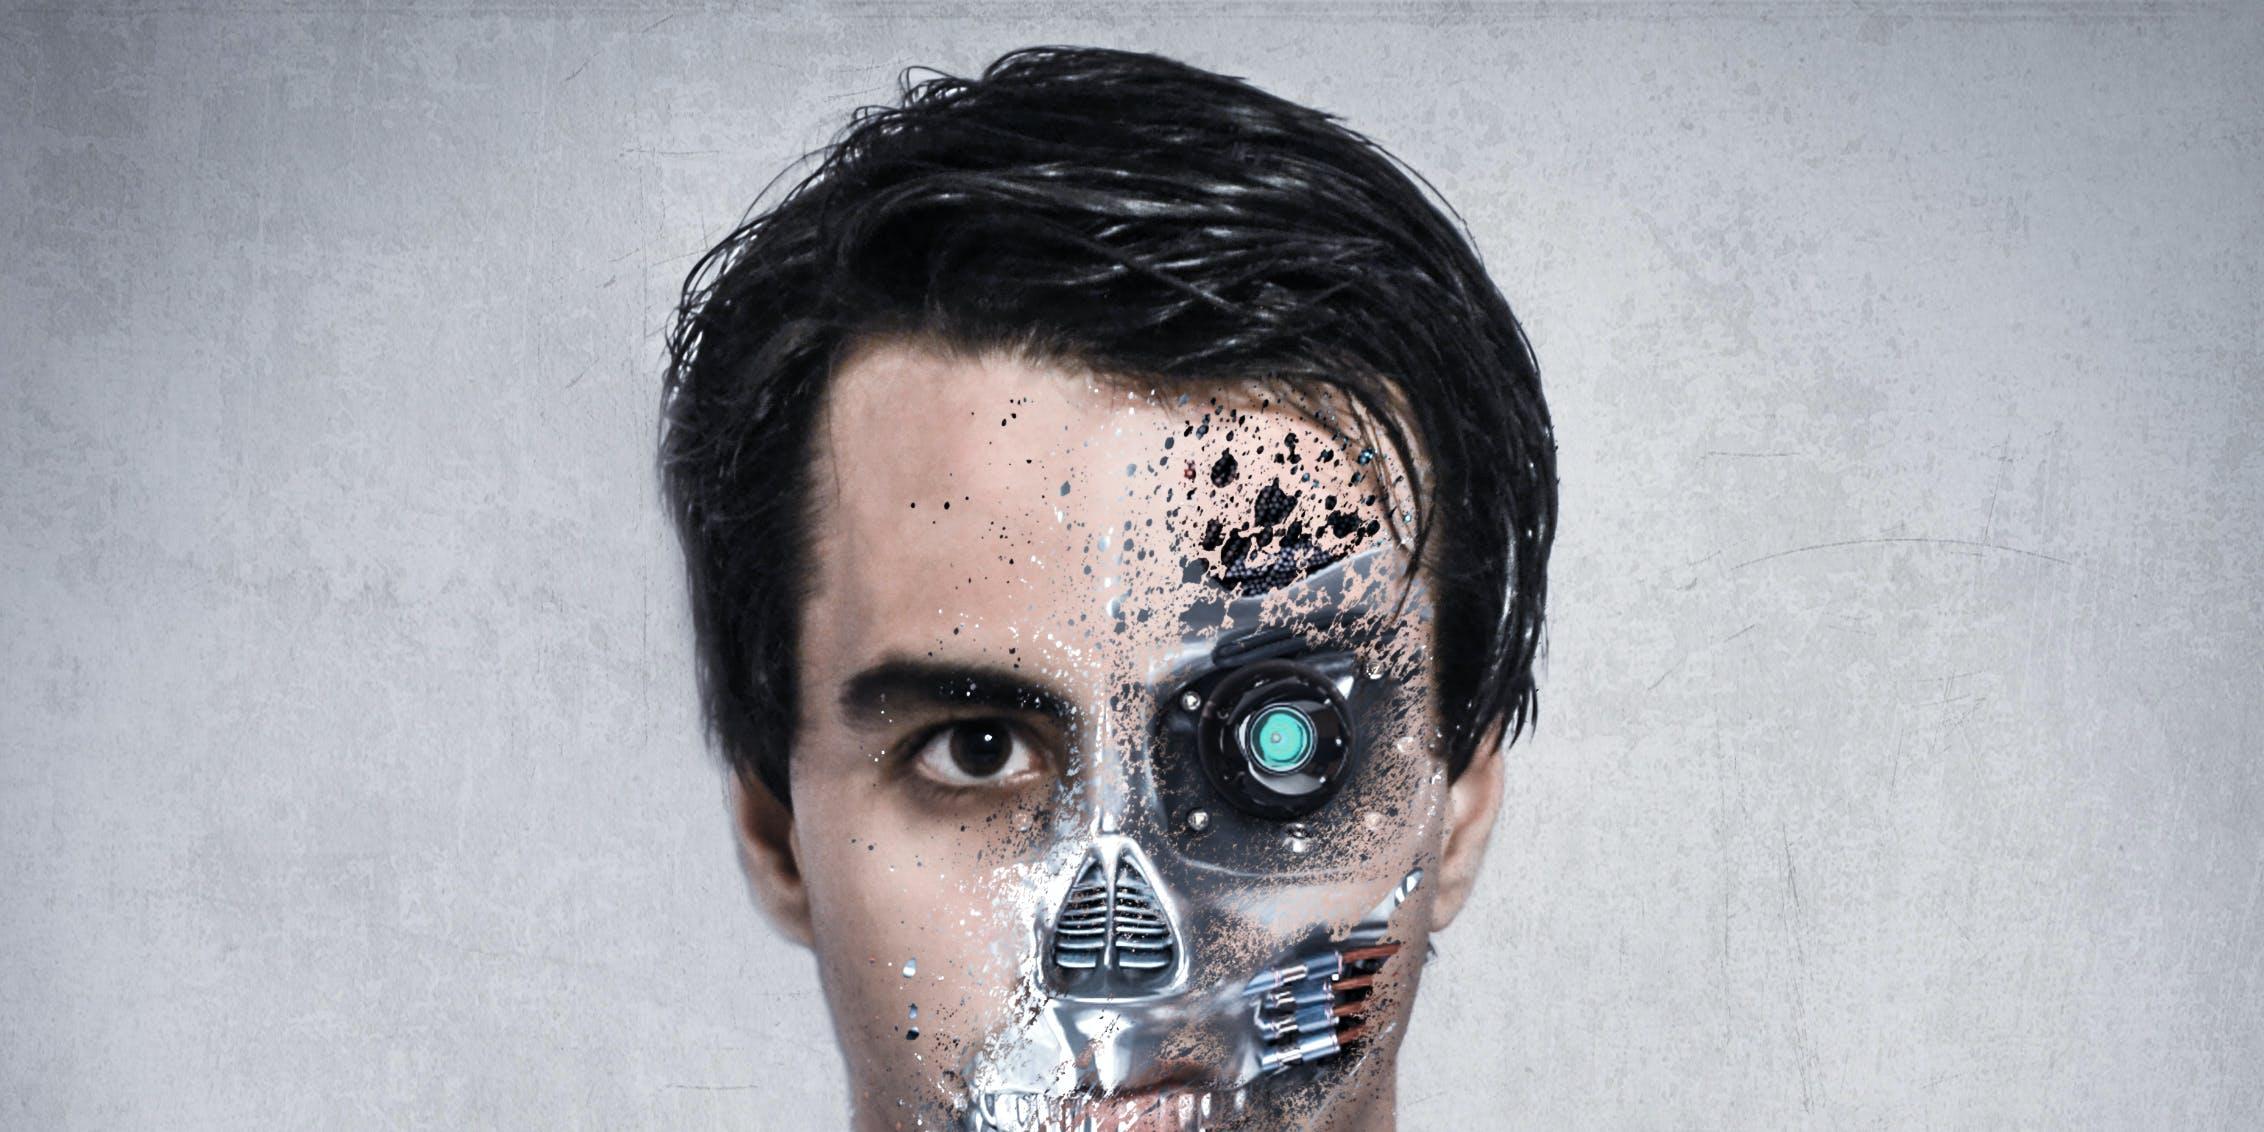 A illustration of a cyborg.